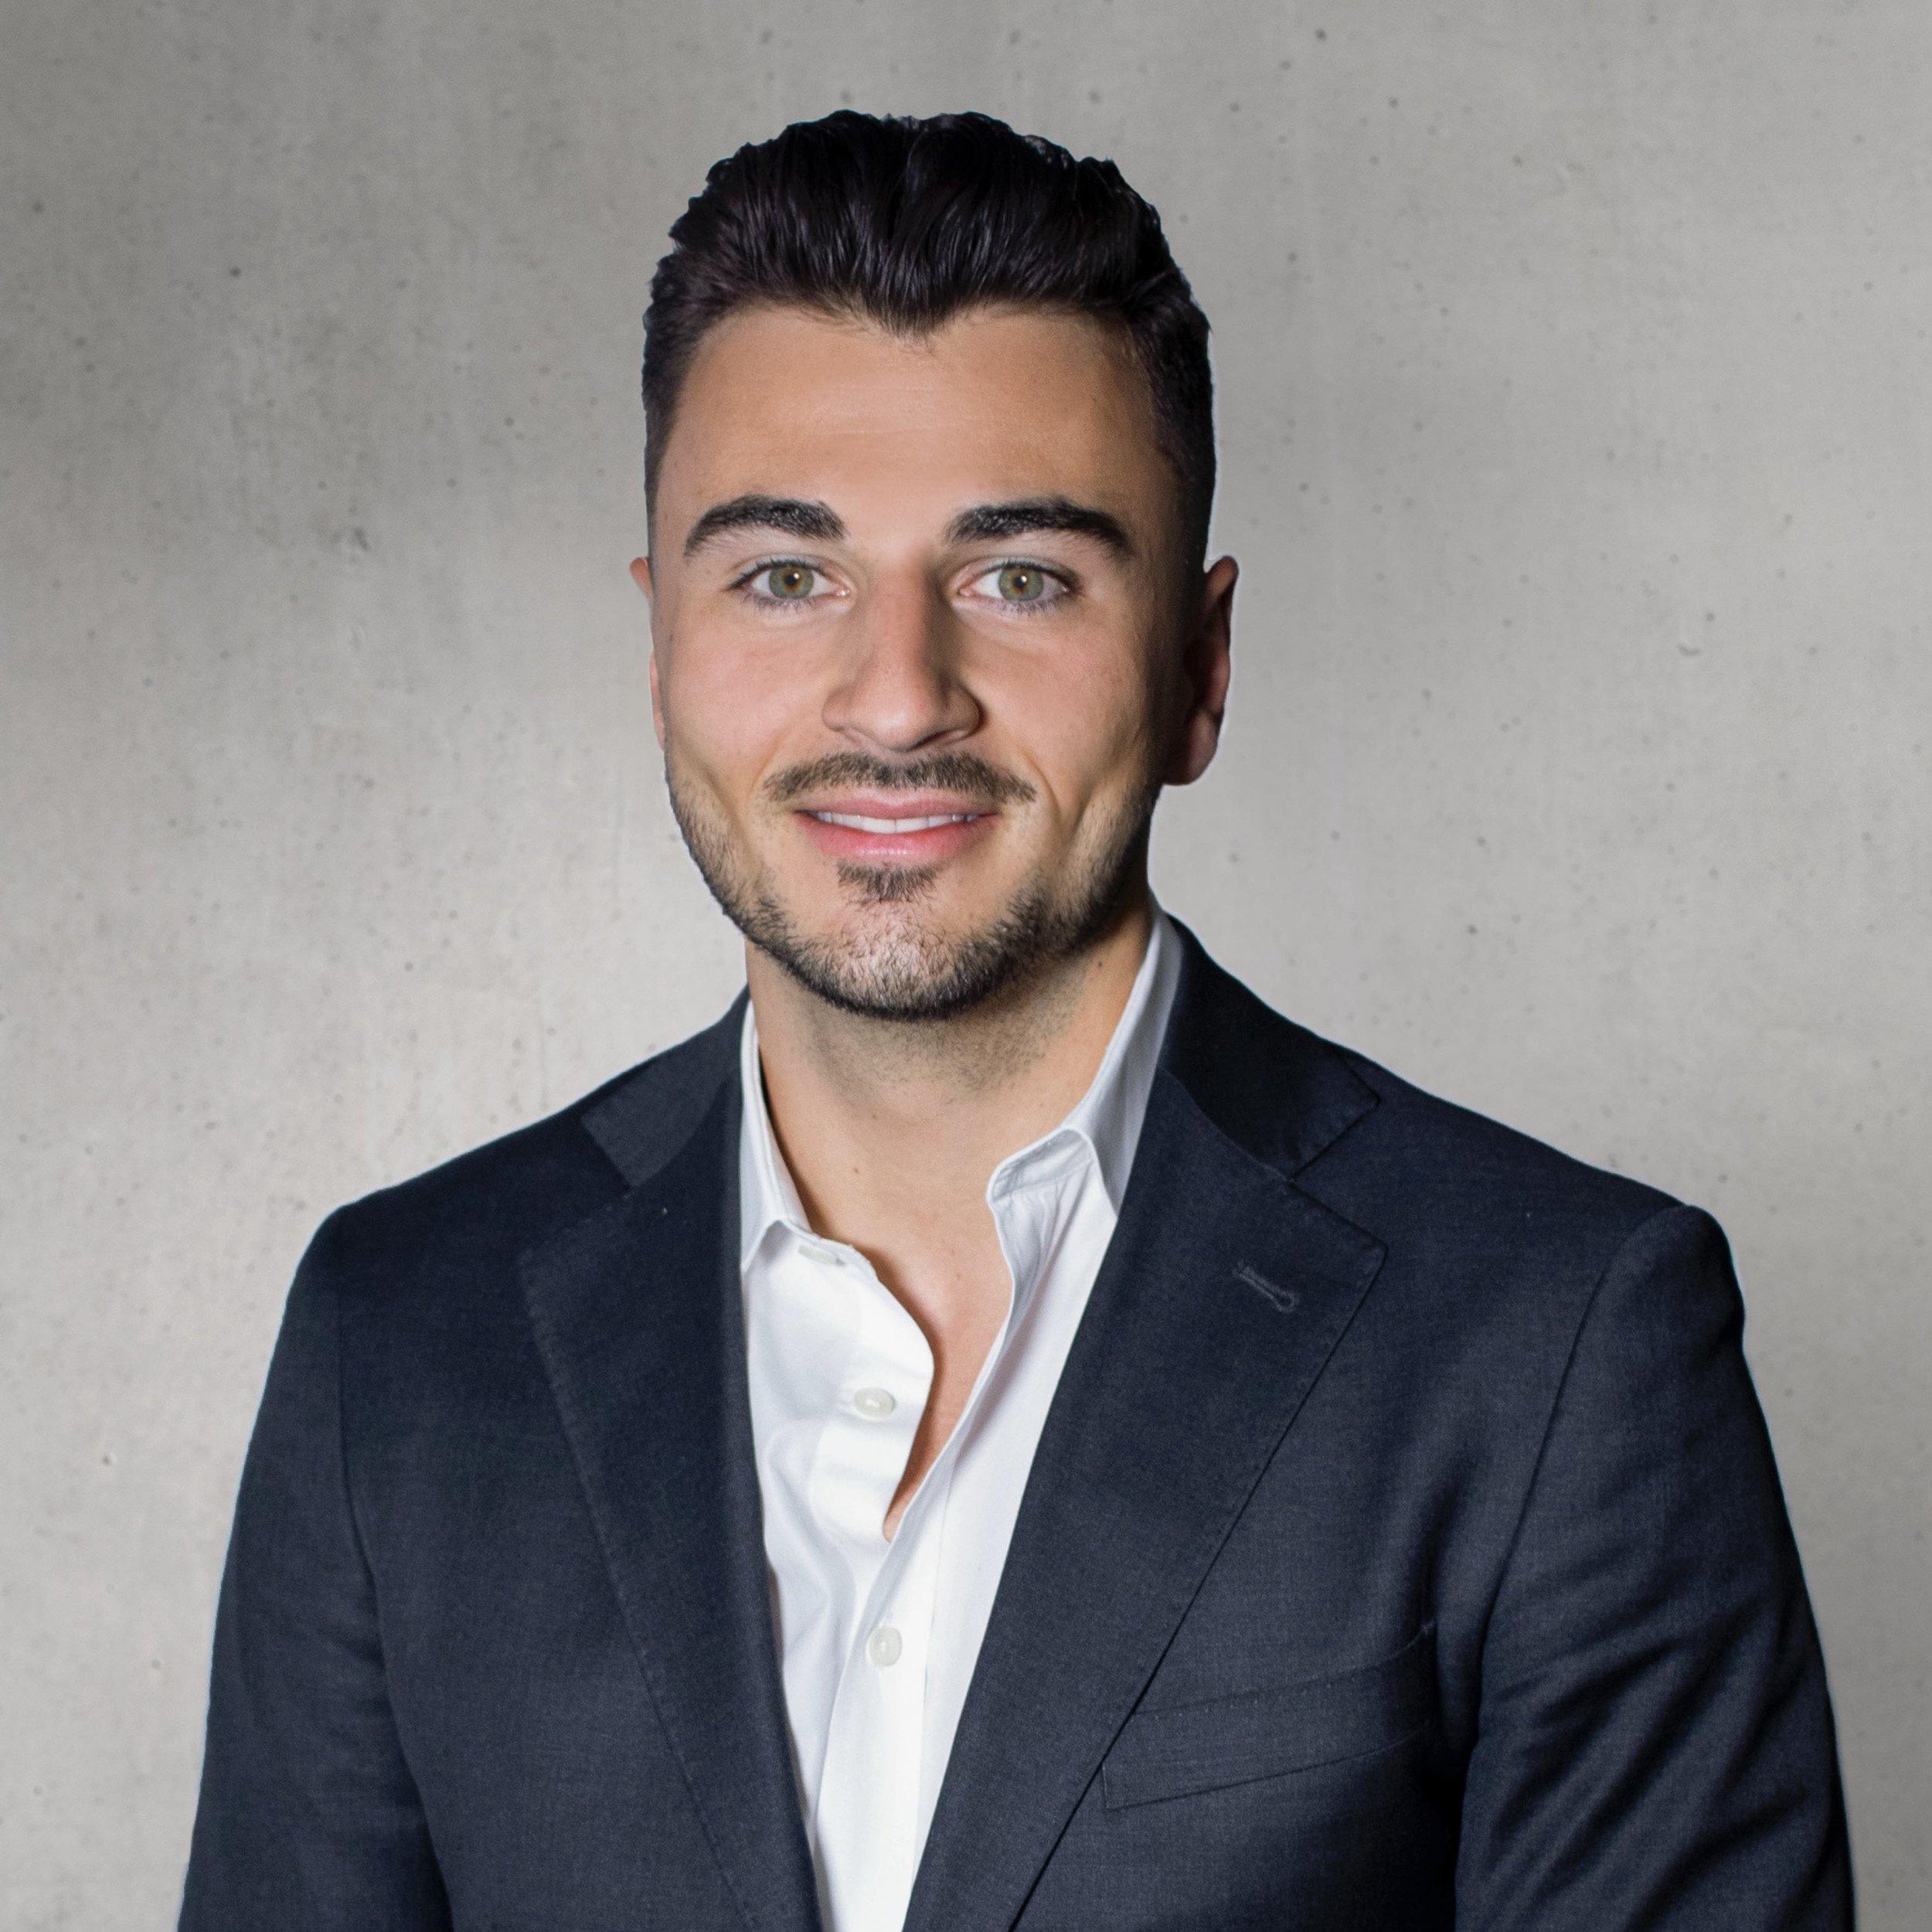 Giuliano Fusco, Partner - Investment Solutionsemail: giuliano.fusco@anovapartners.comdirect no.: +41 44 215 24 69